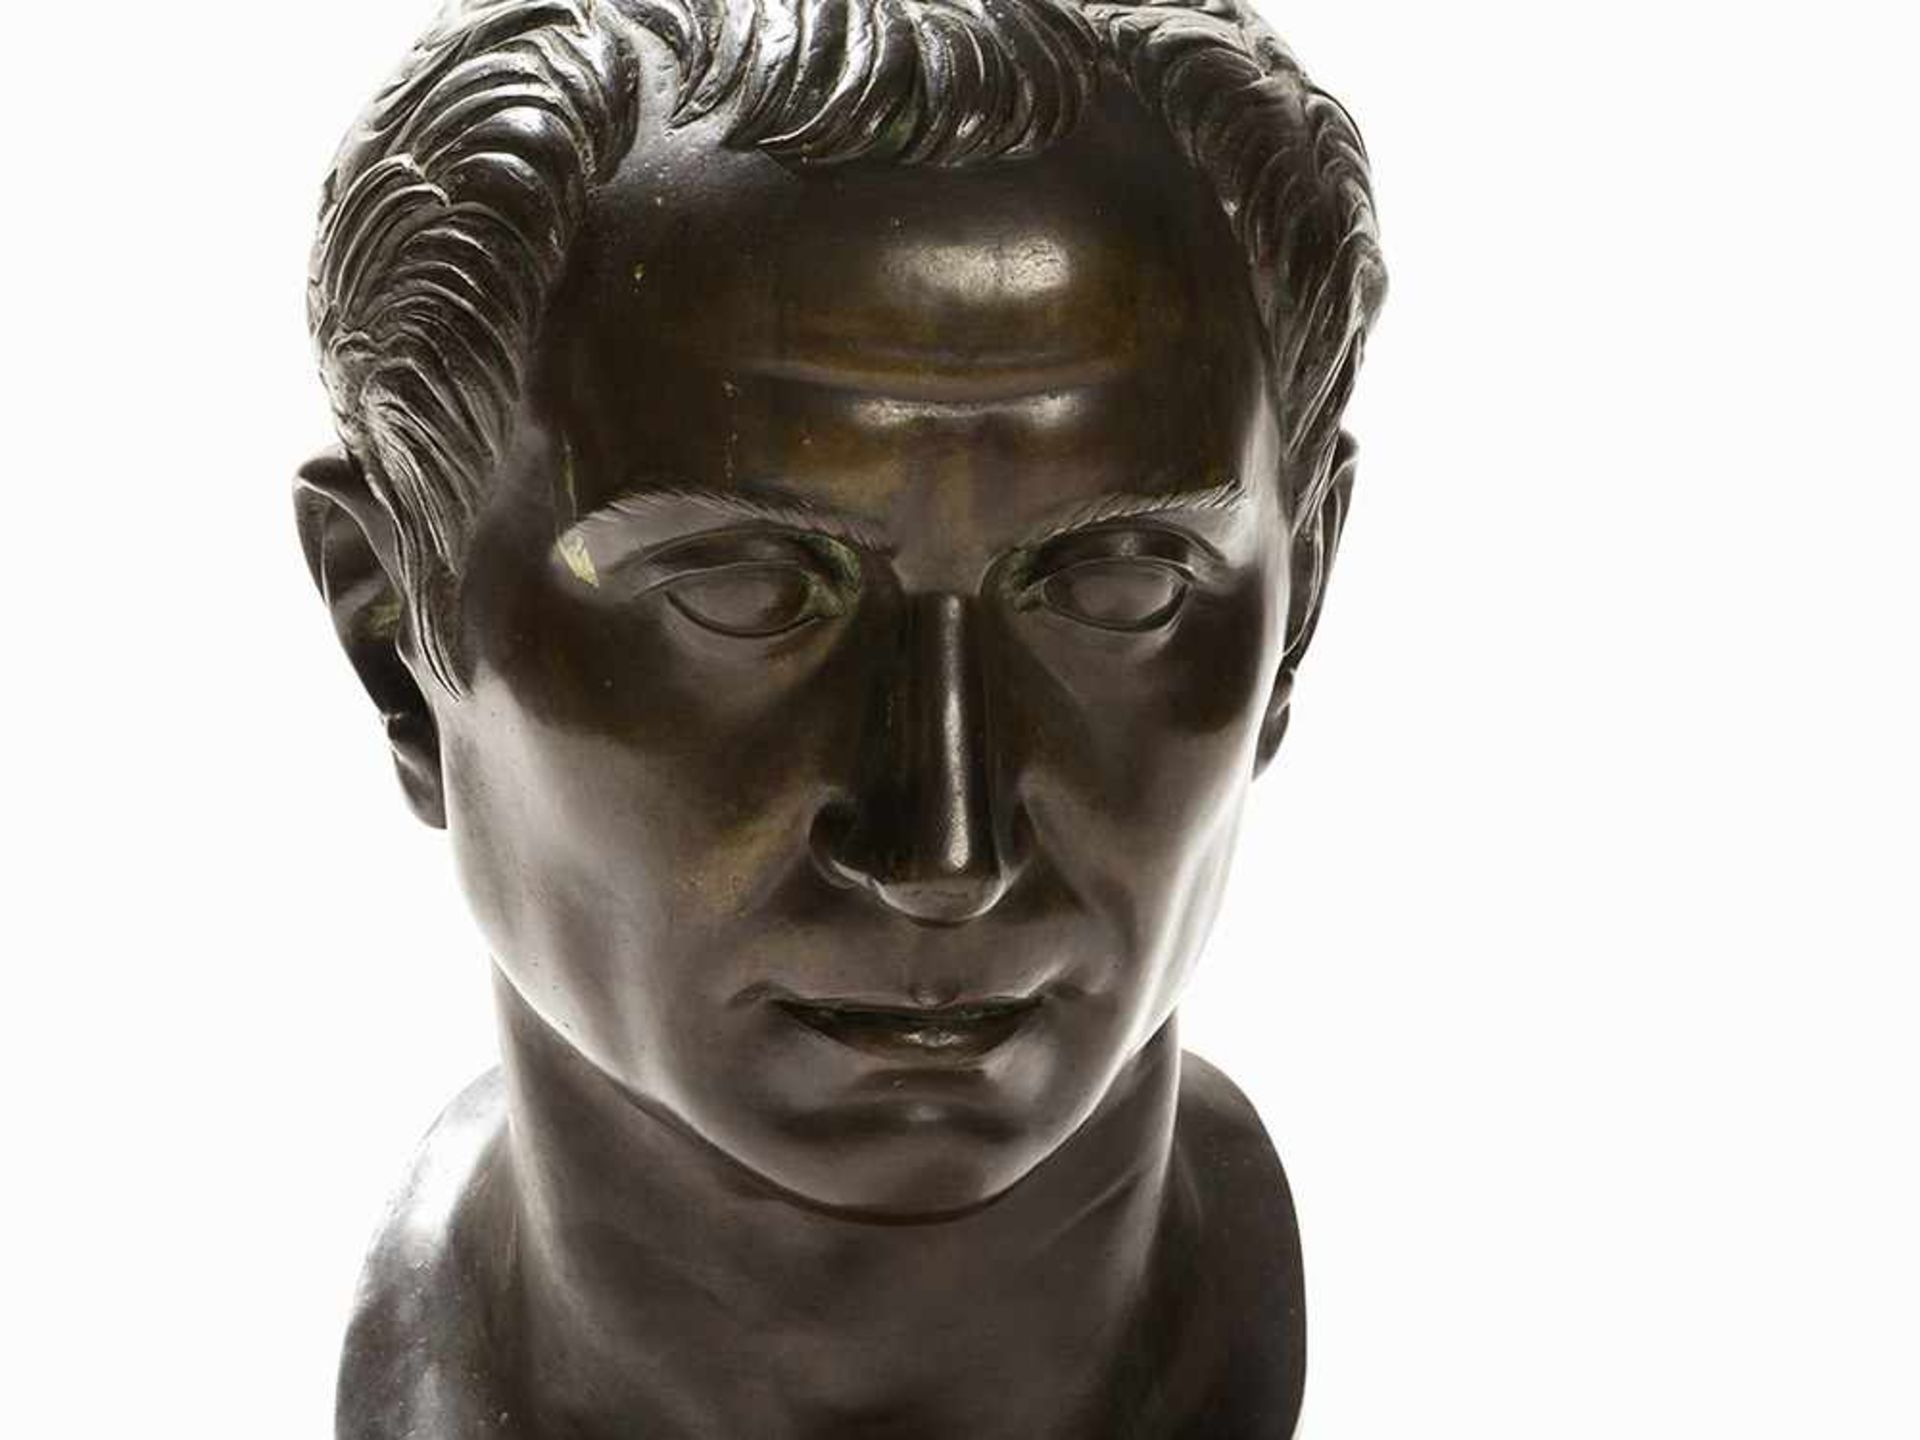 Los 91 - Bronzebüste, Julius Caesar, Italien, Frühes 20. Jh. Bronze, grün patiniert, Marmorsockel. Italien,